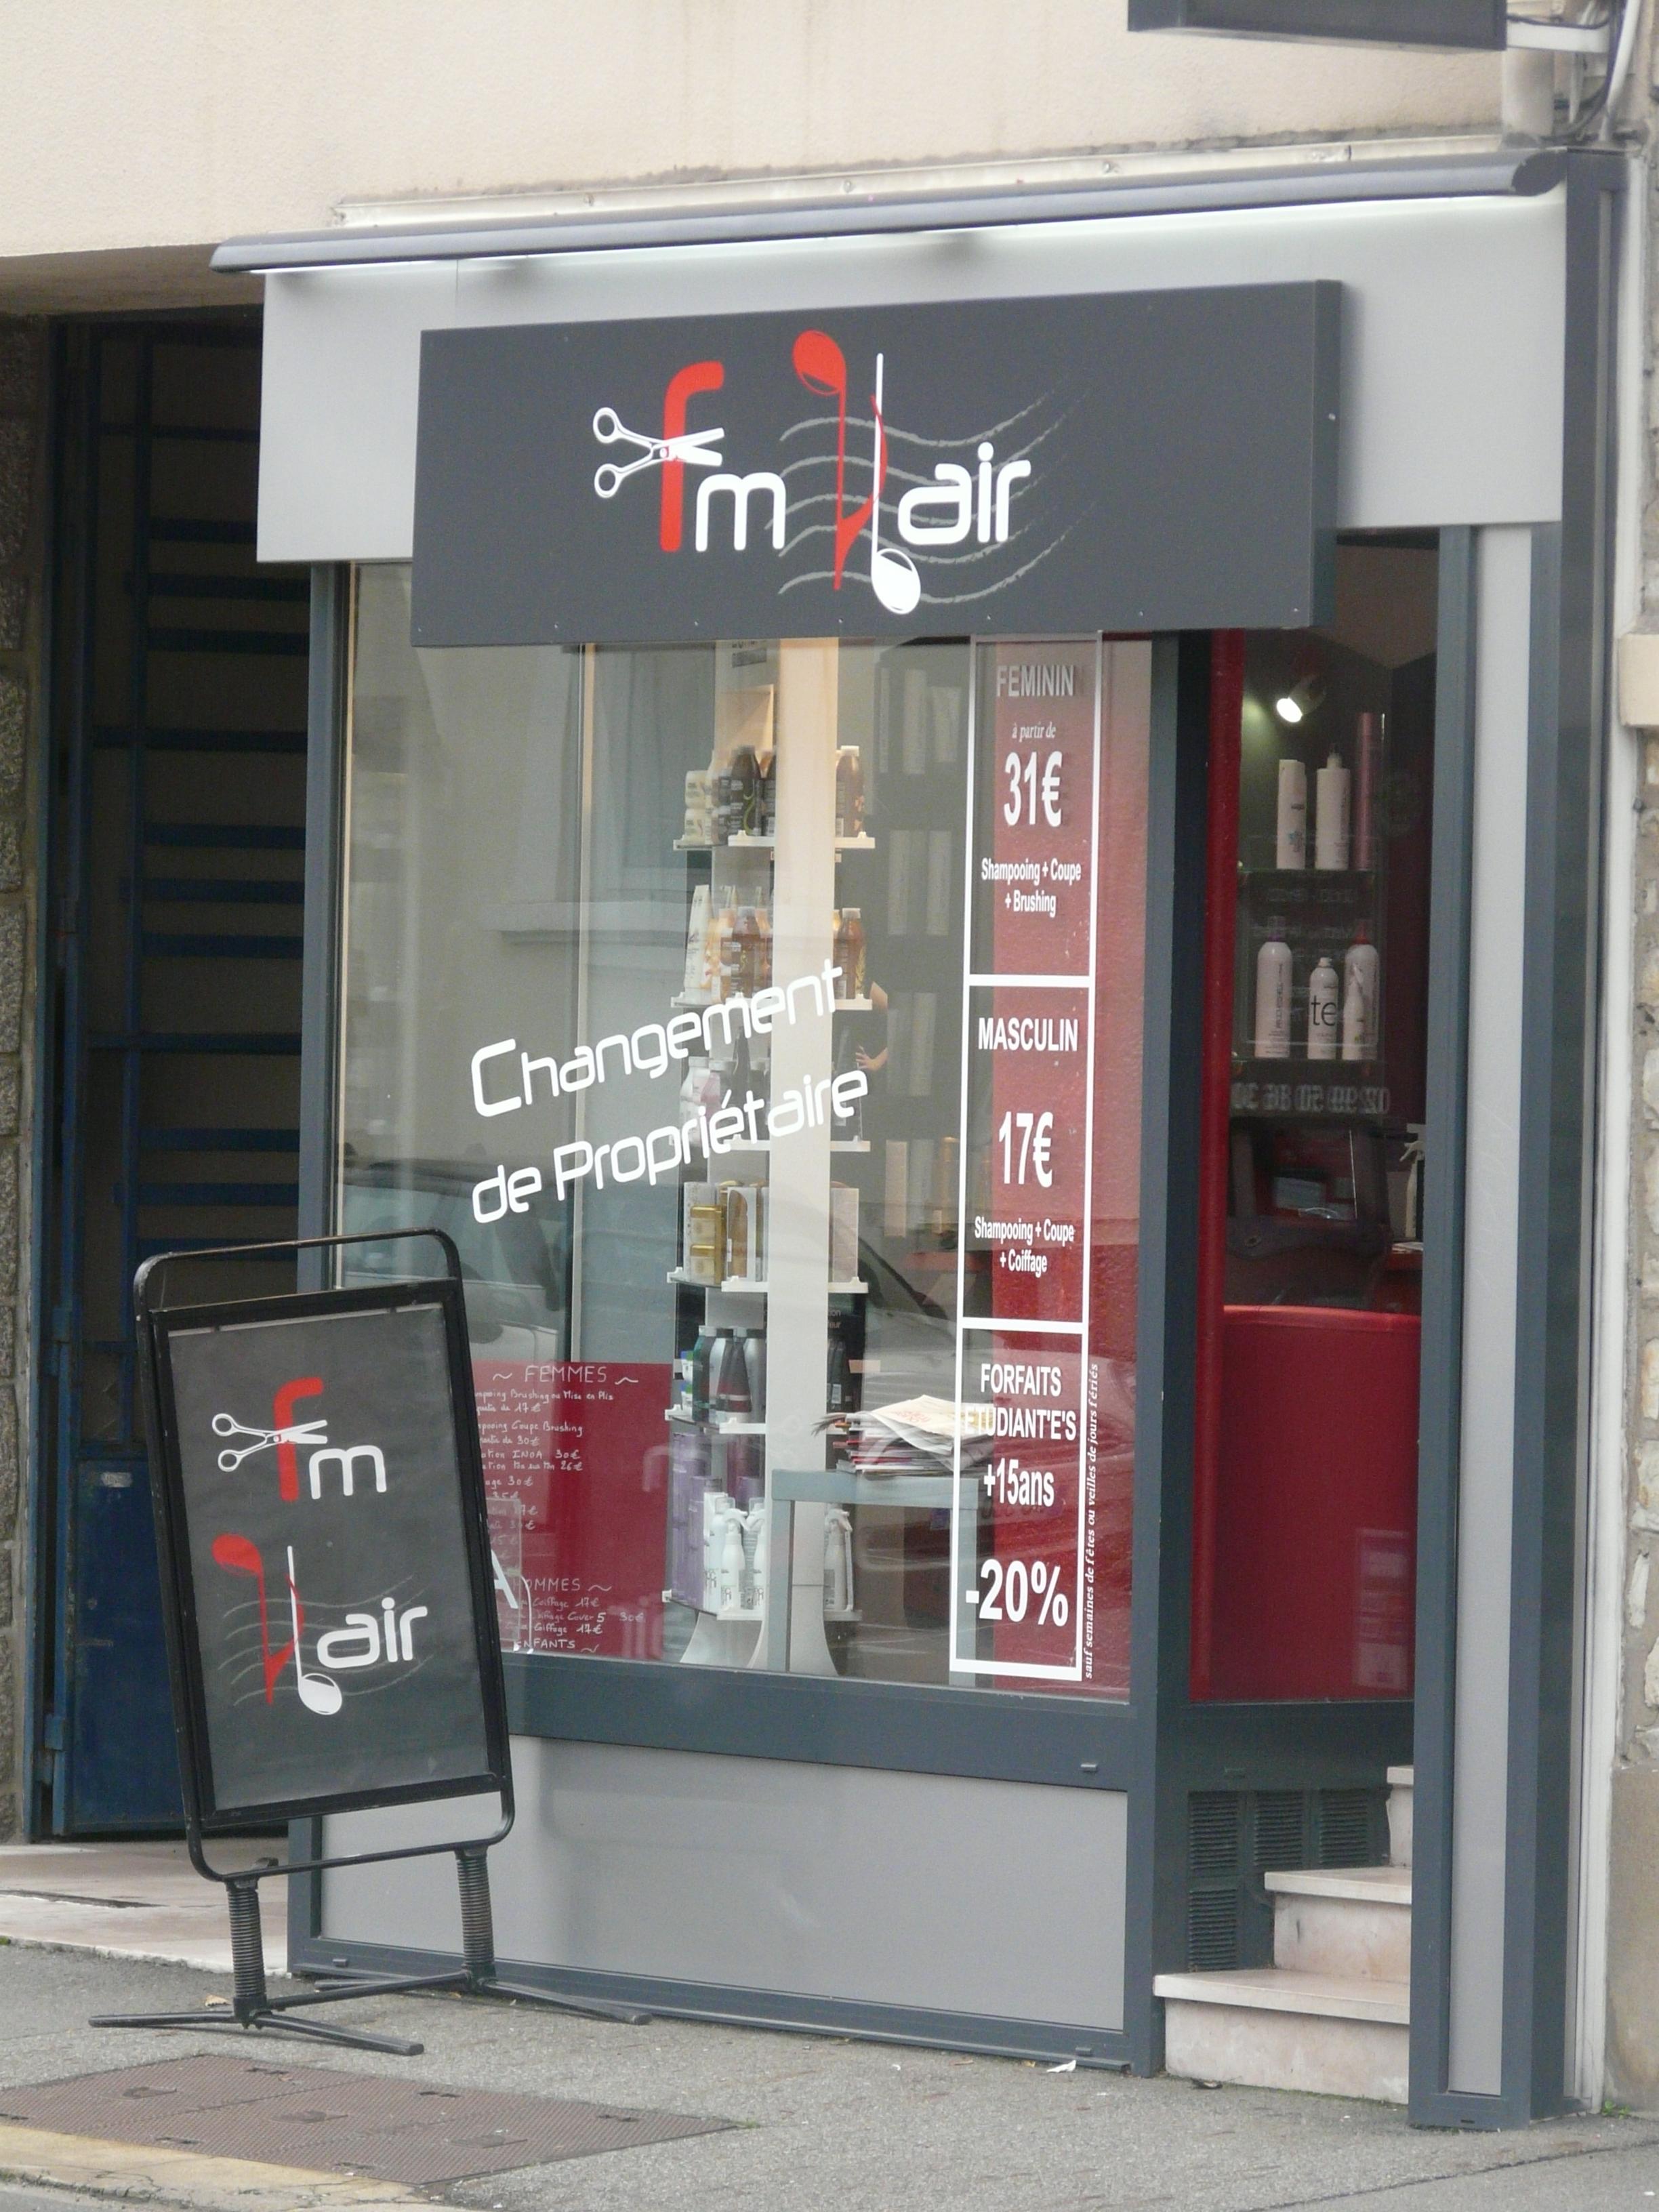 Fm 39 hair rennes avis tarifs horaires t l phone for Salon coiffure rennes